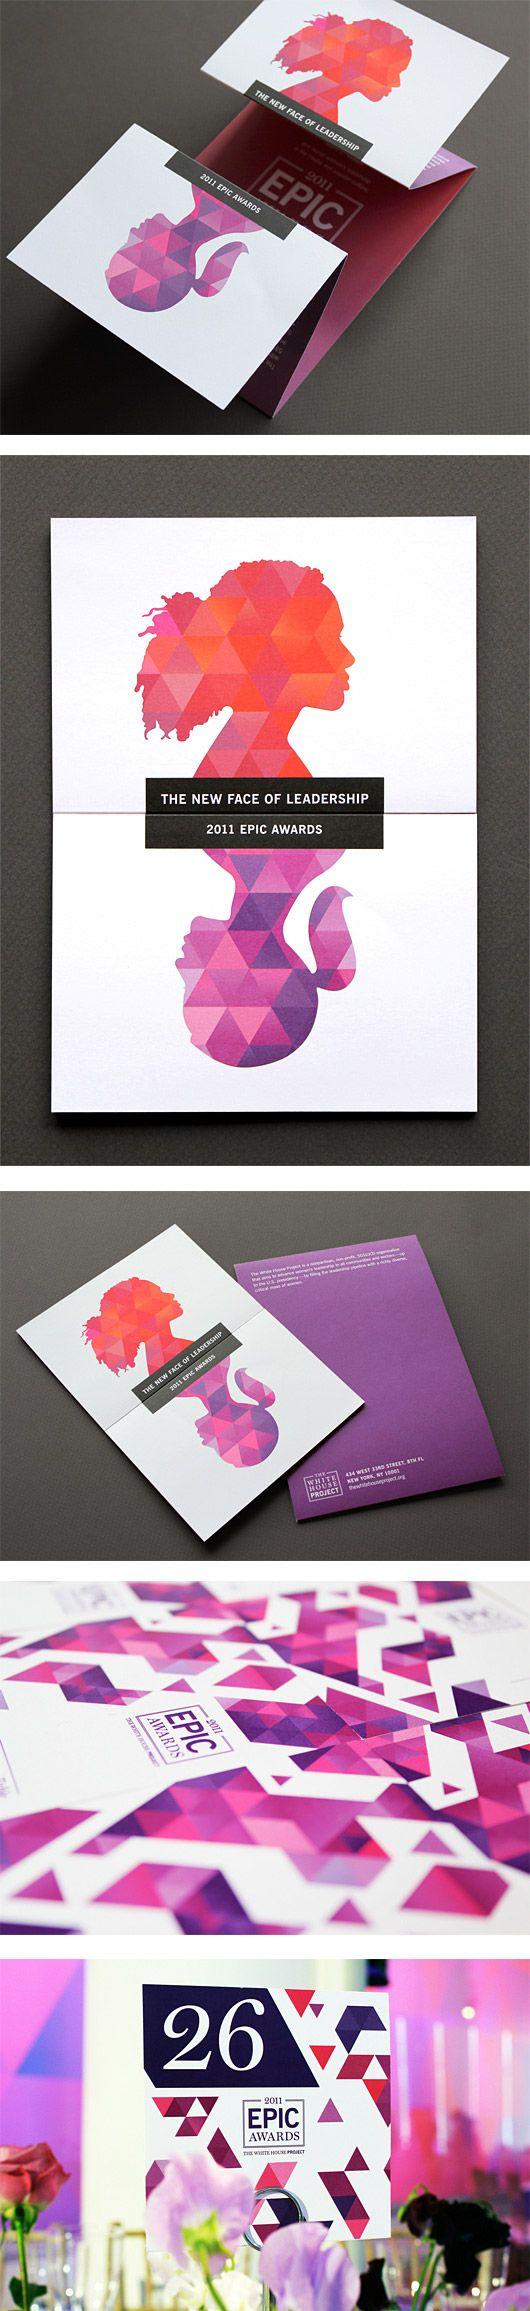 2011 EPIC Awards || Hyperakt #branding #identity #neato #color #design #inspiration